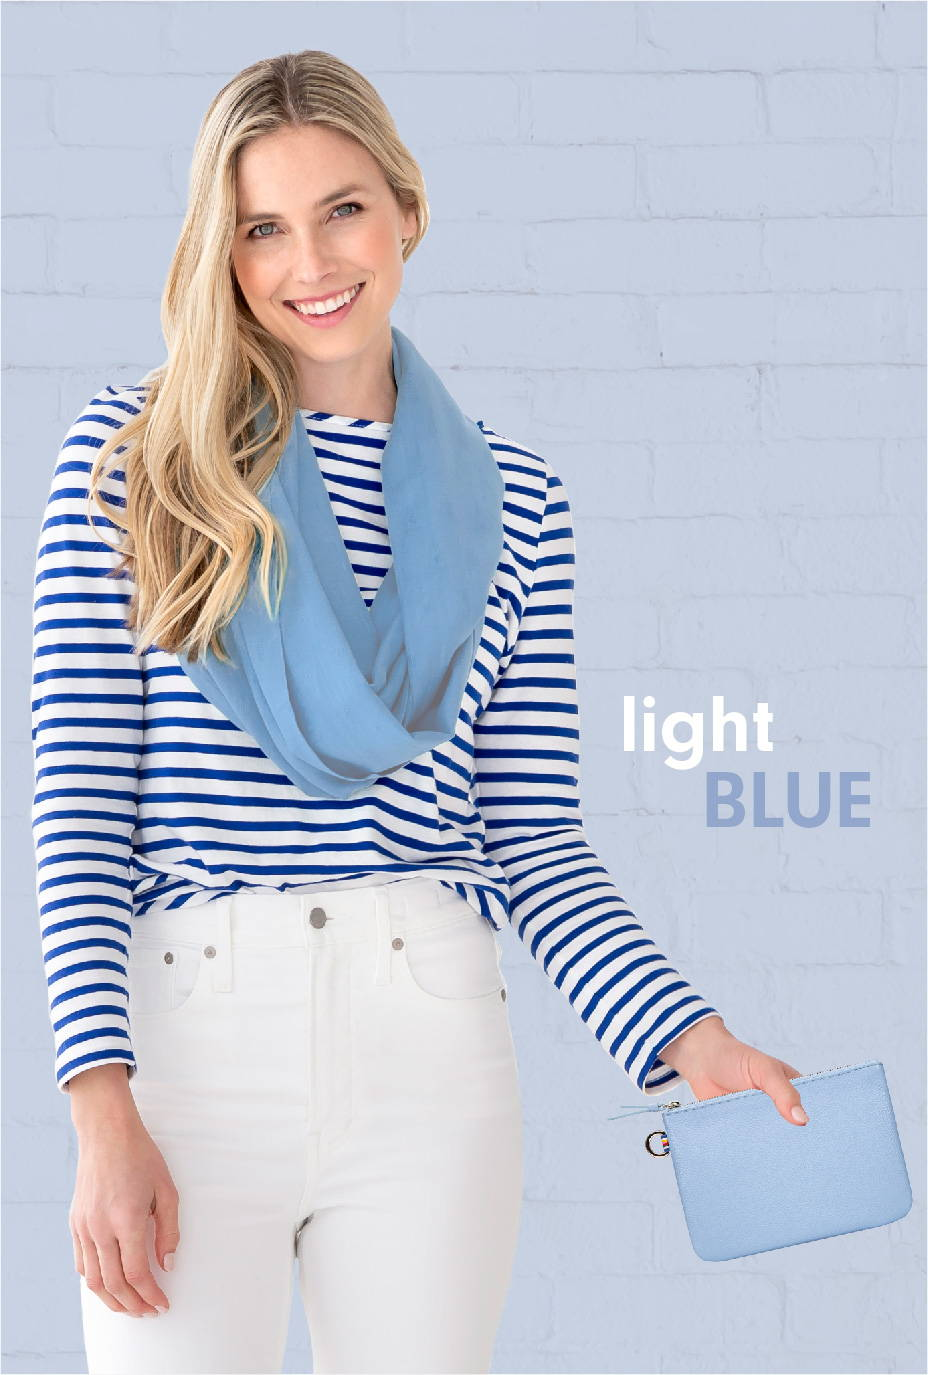 new spring color light blue